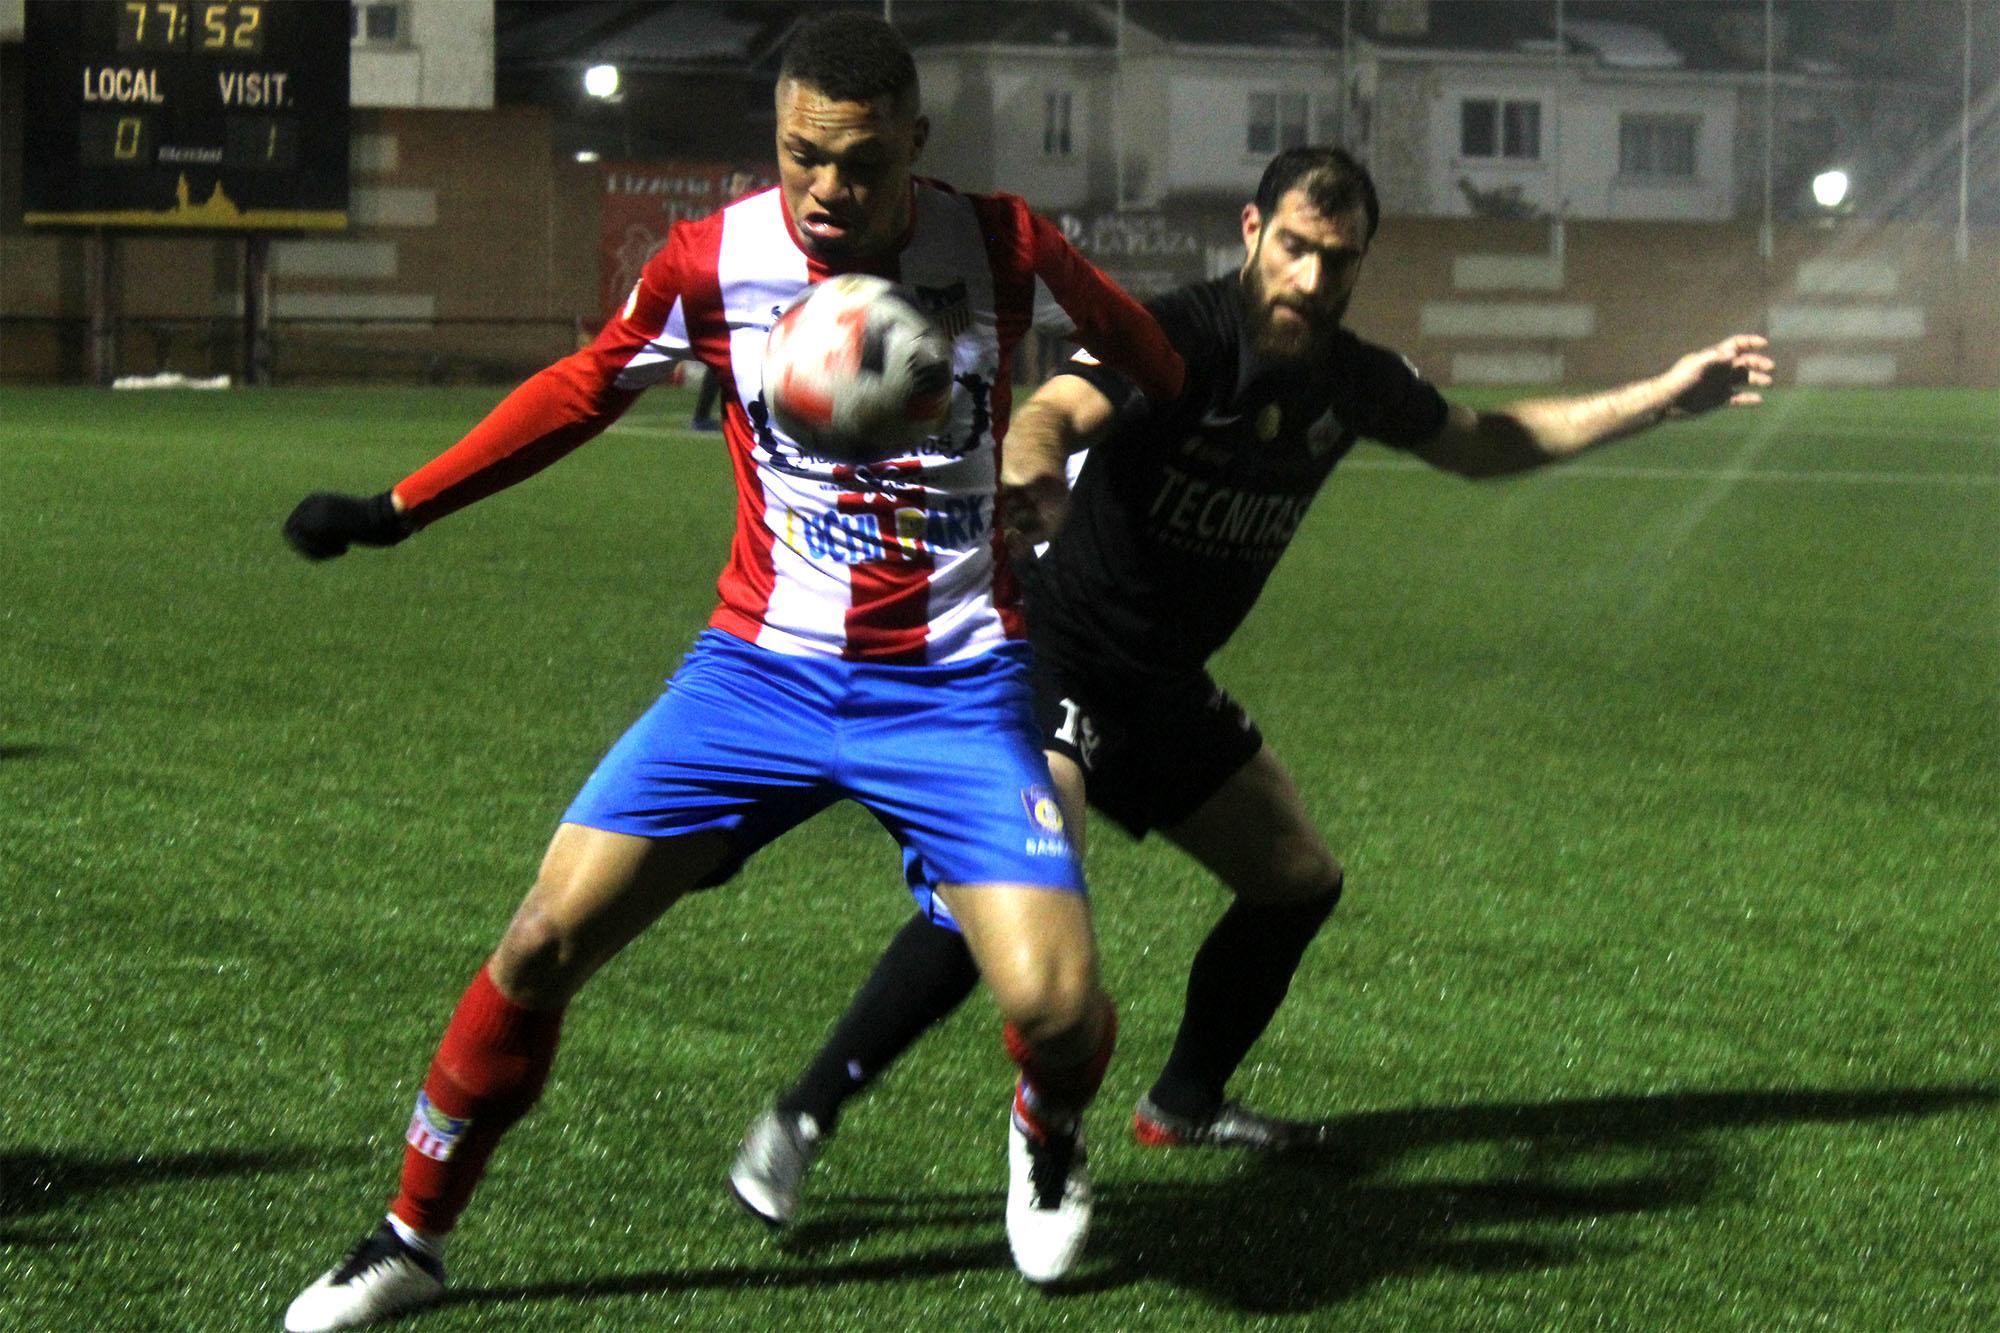 FOTOS / Sara Olmos (RFFM) - Navalcarnero - UD Sanse 1-1 (Segunda B - Subgrupo 5A - Jornada 10)